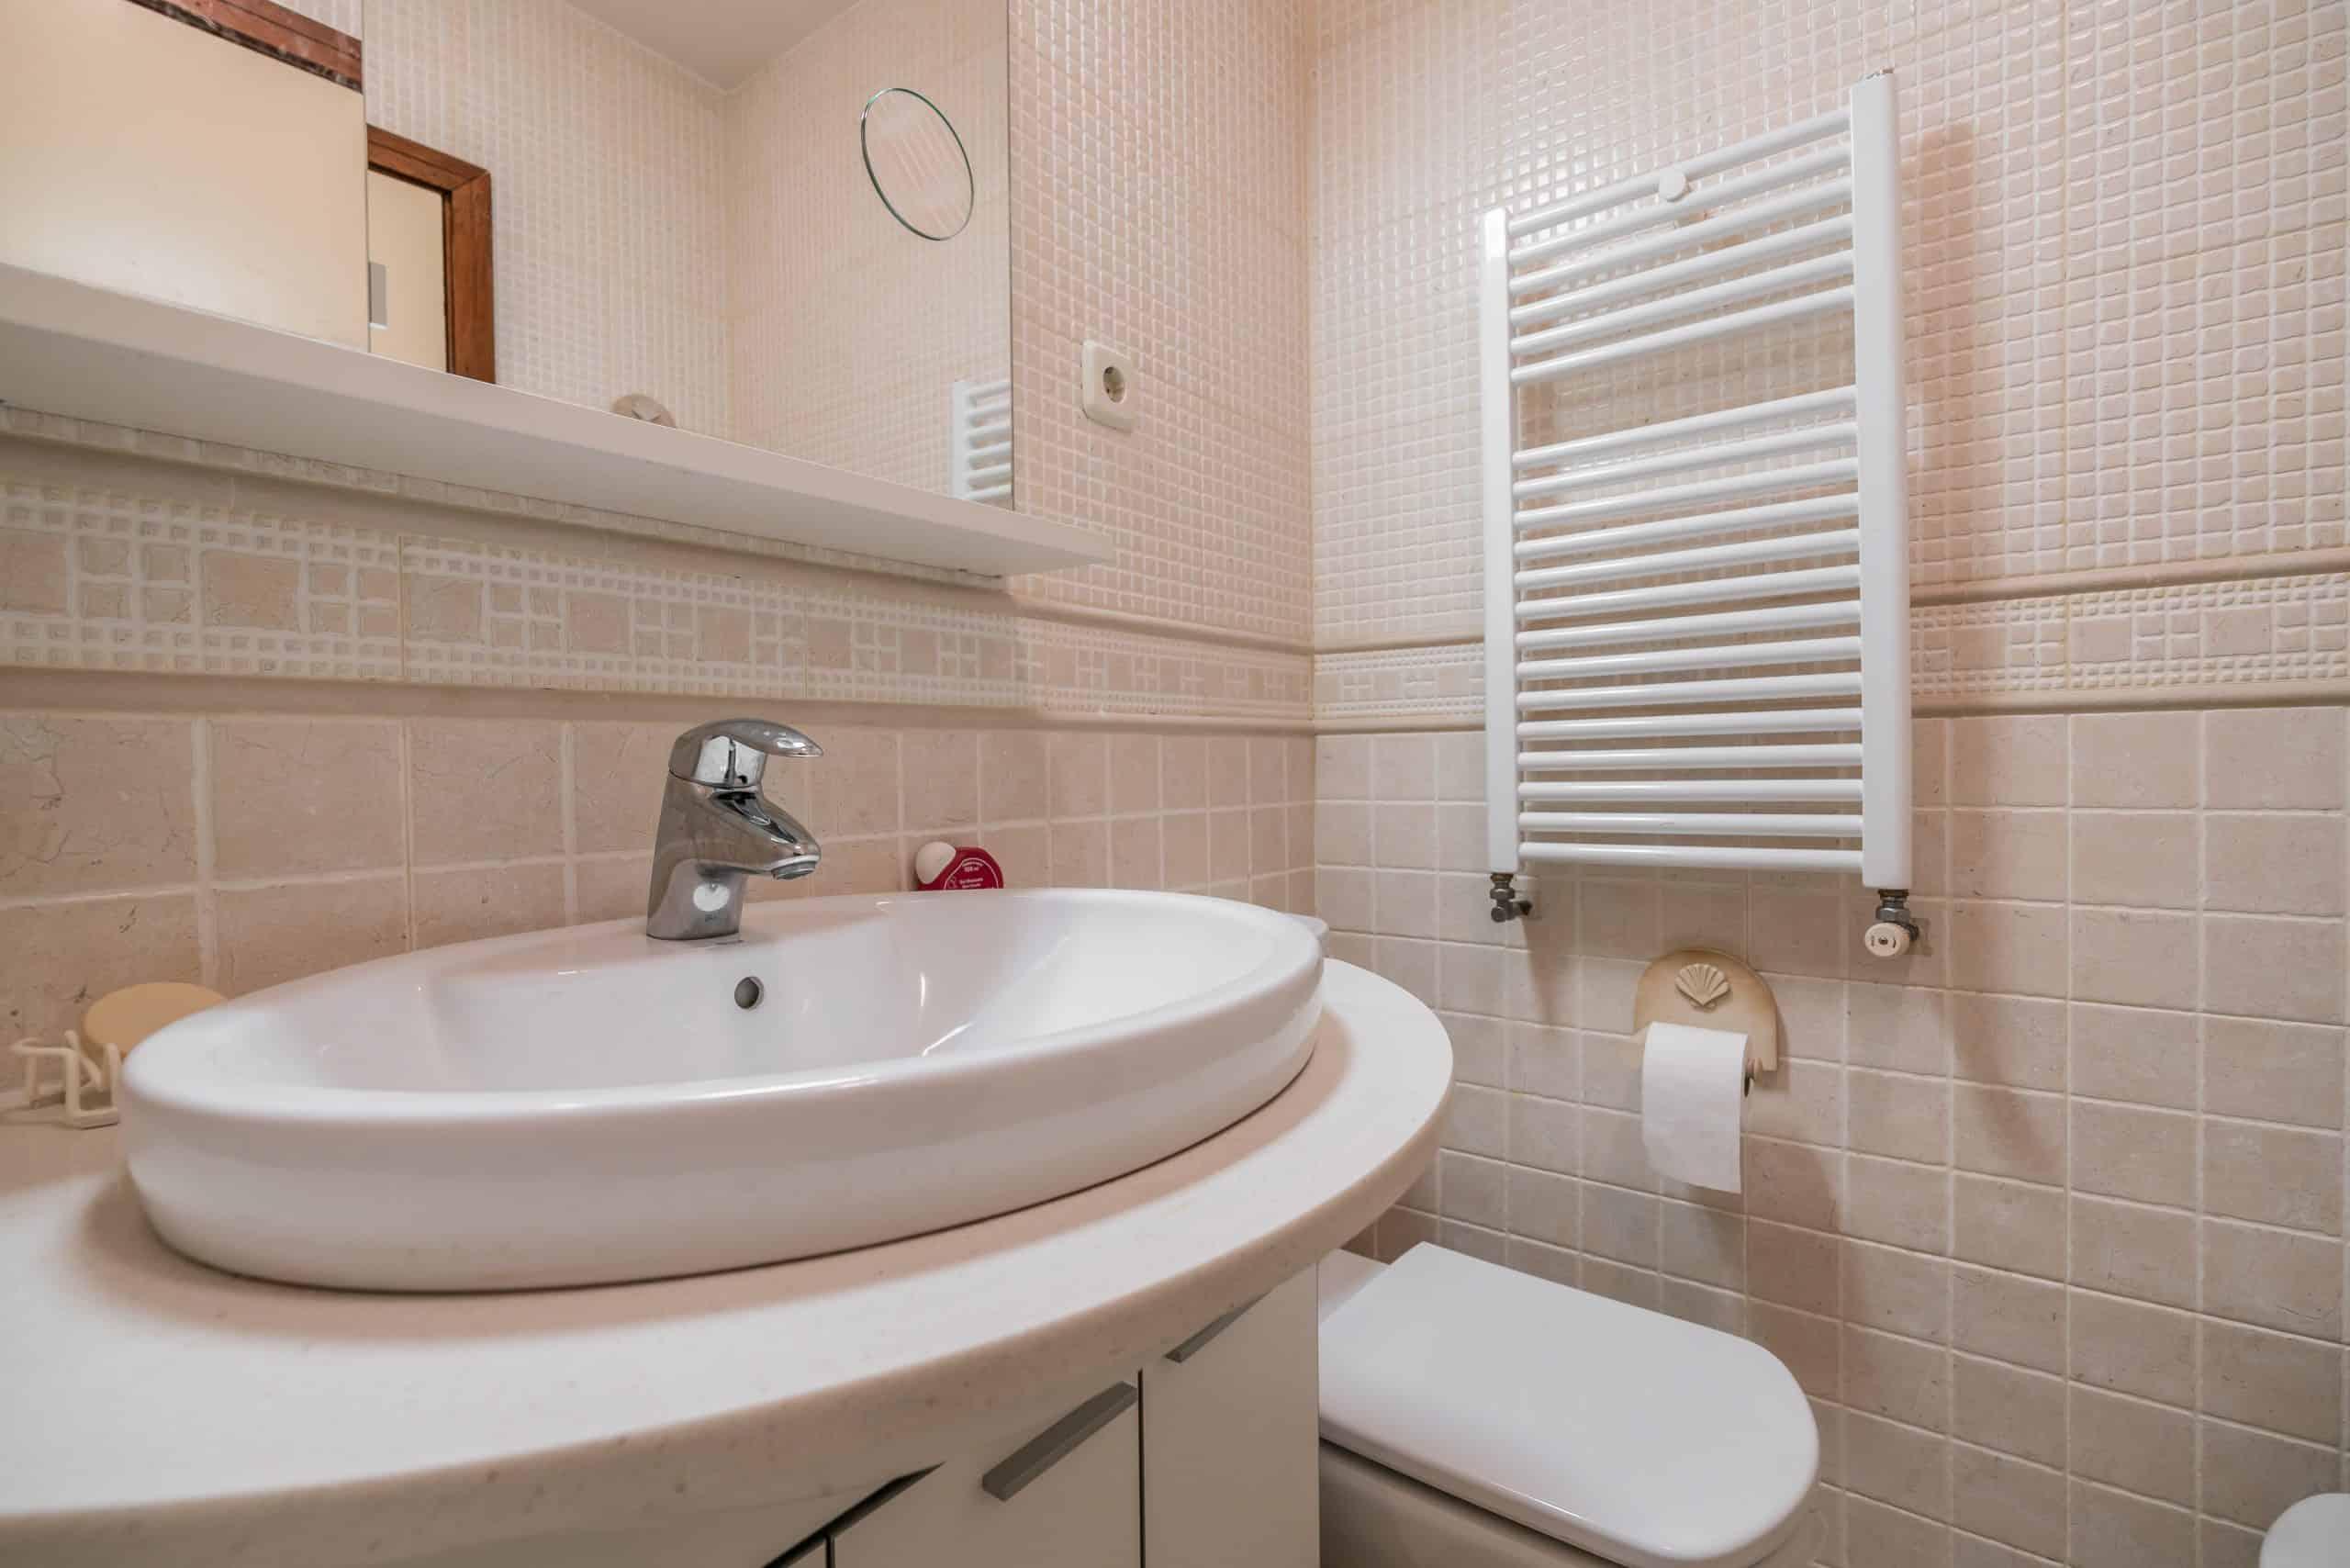 Agencia Inmobiliaria de Madrid-FUTUROCASA-Zona ARGANZUELA-EMBAJADORES-LEGAZPI -calle Embajadores- baño 133